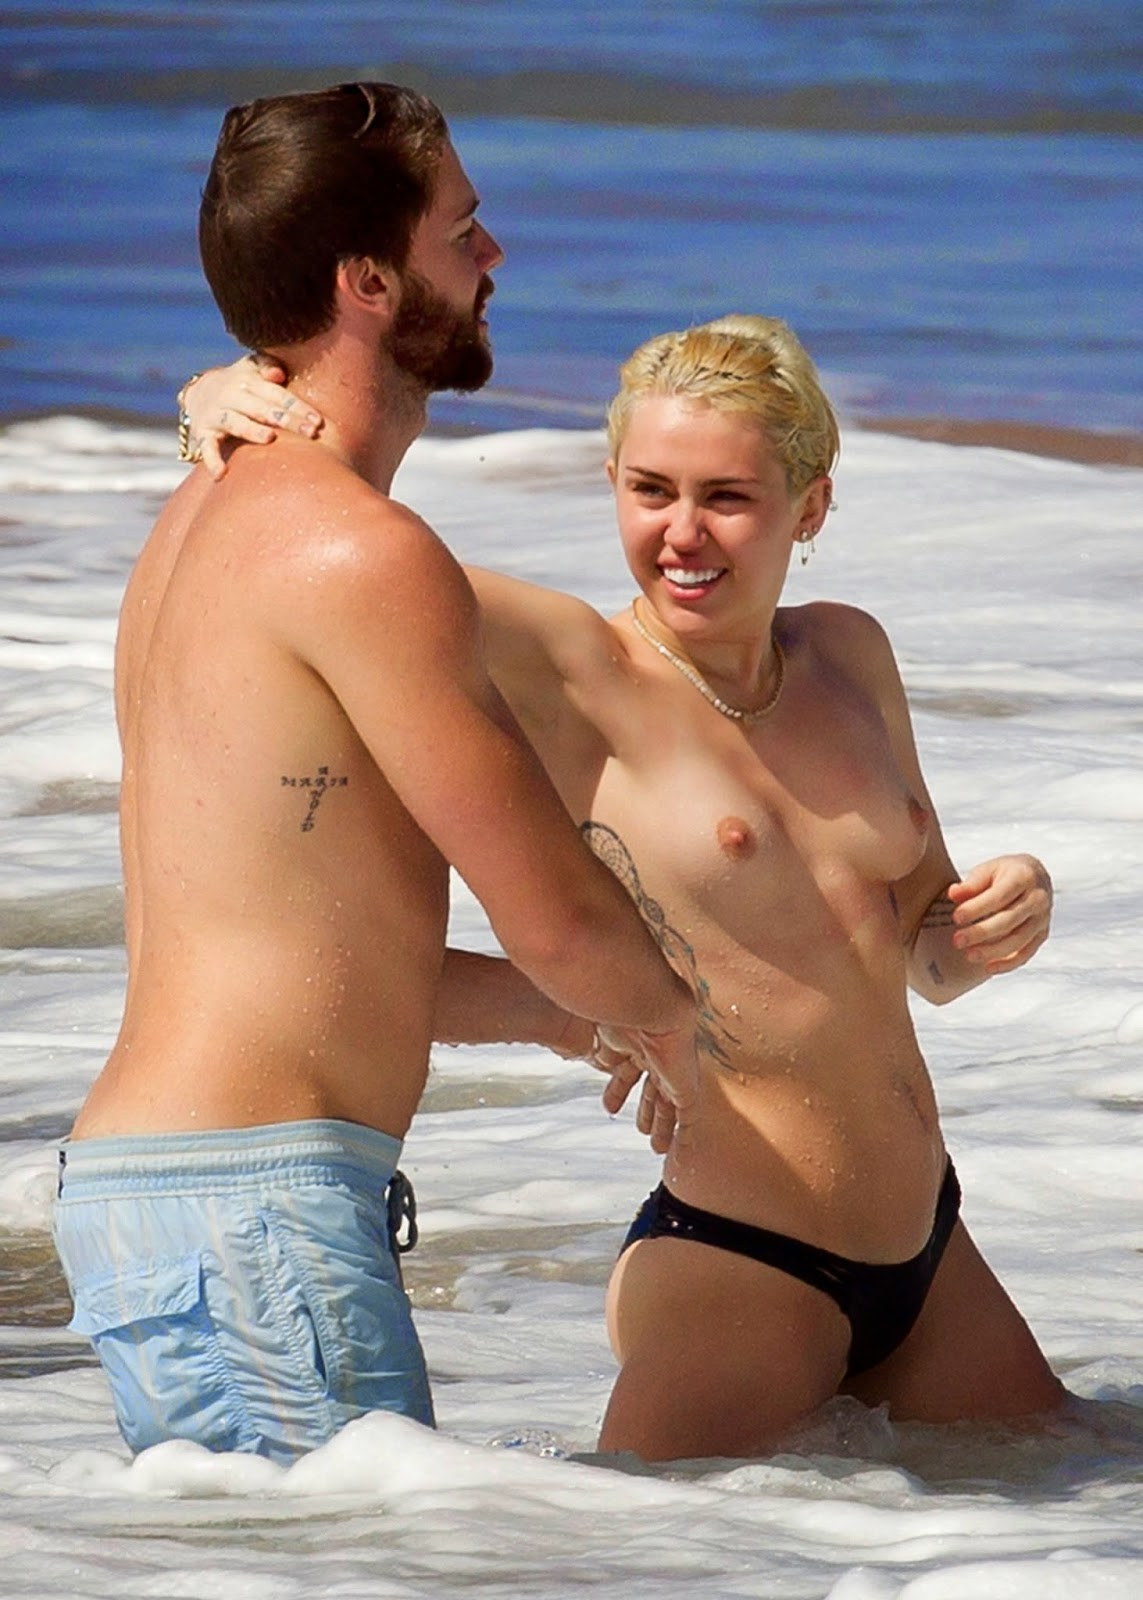 Katey sagal boobs